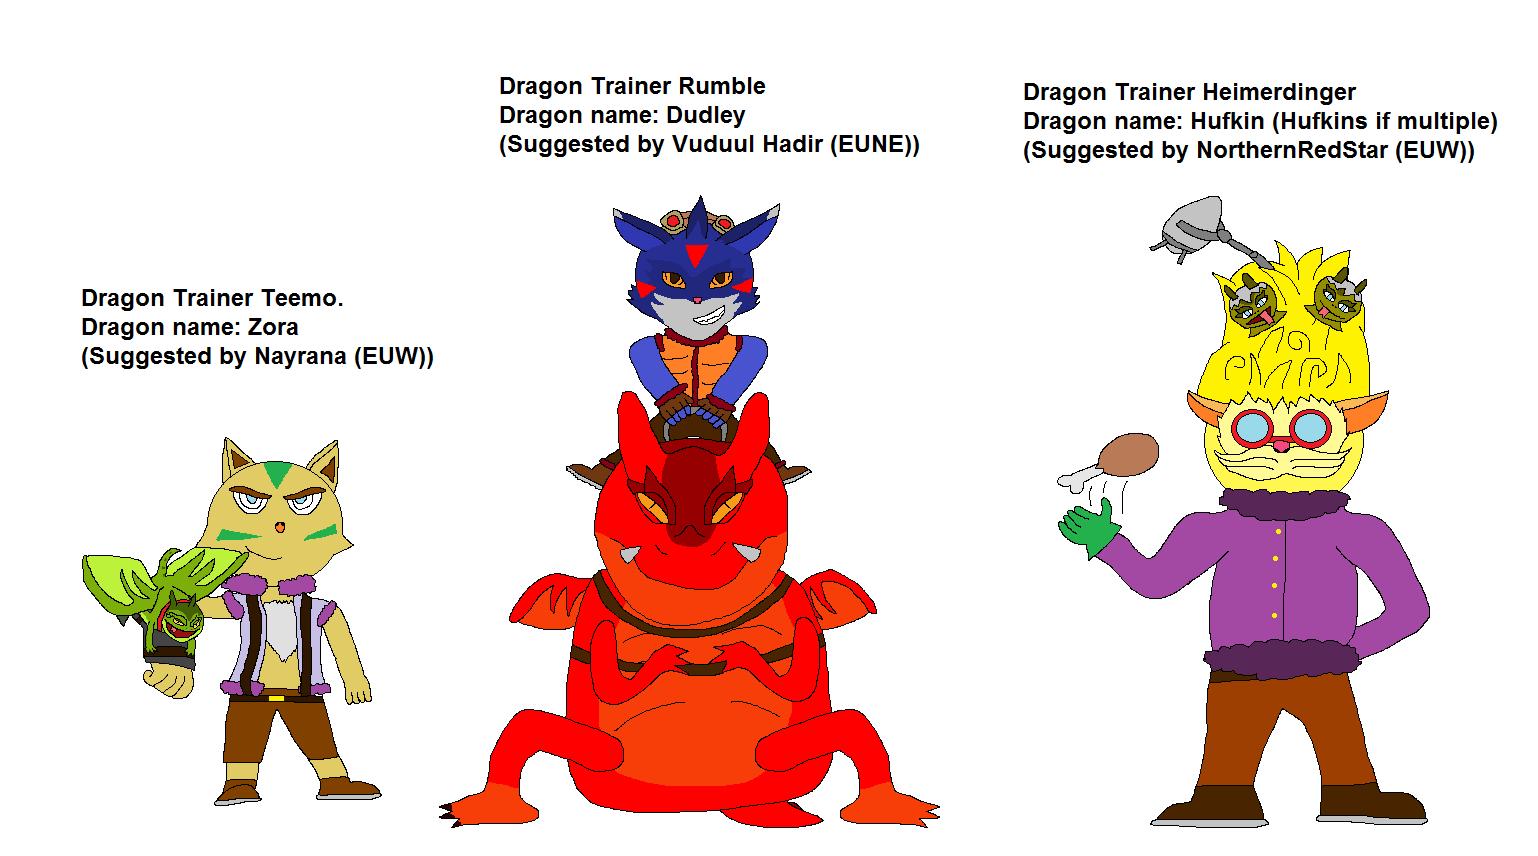 http://orig01.deviantart.net/efab/f/2016/083/5/3/3_dragon_trainers__teemo __rumble_and_heimerdinger__by_johnnyhedgehog1992-d9wbqj7.png